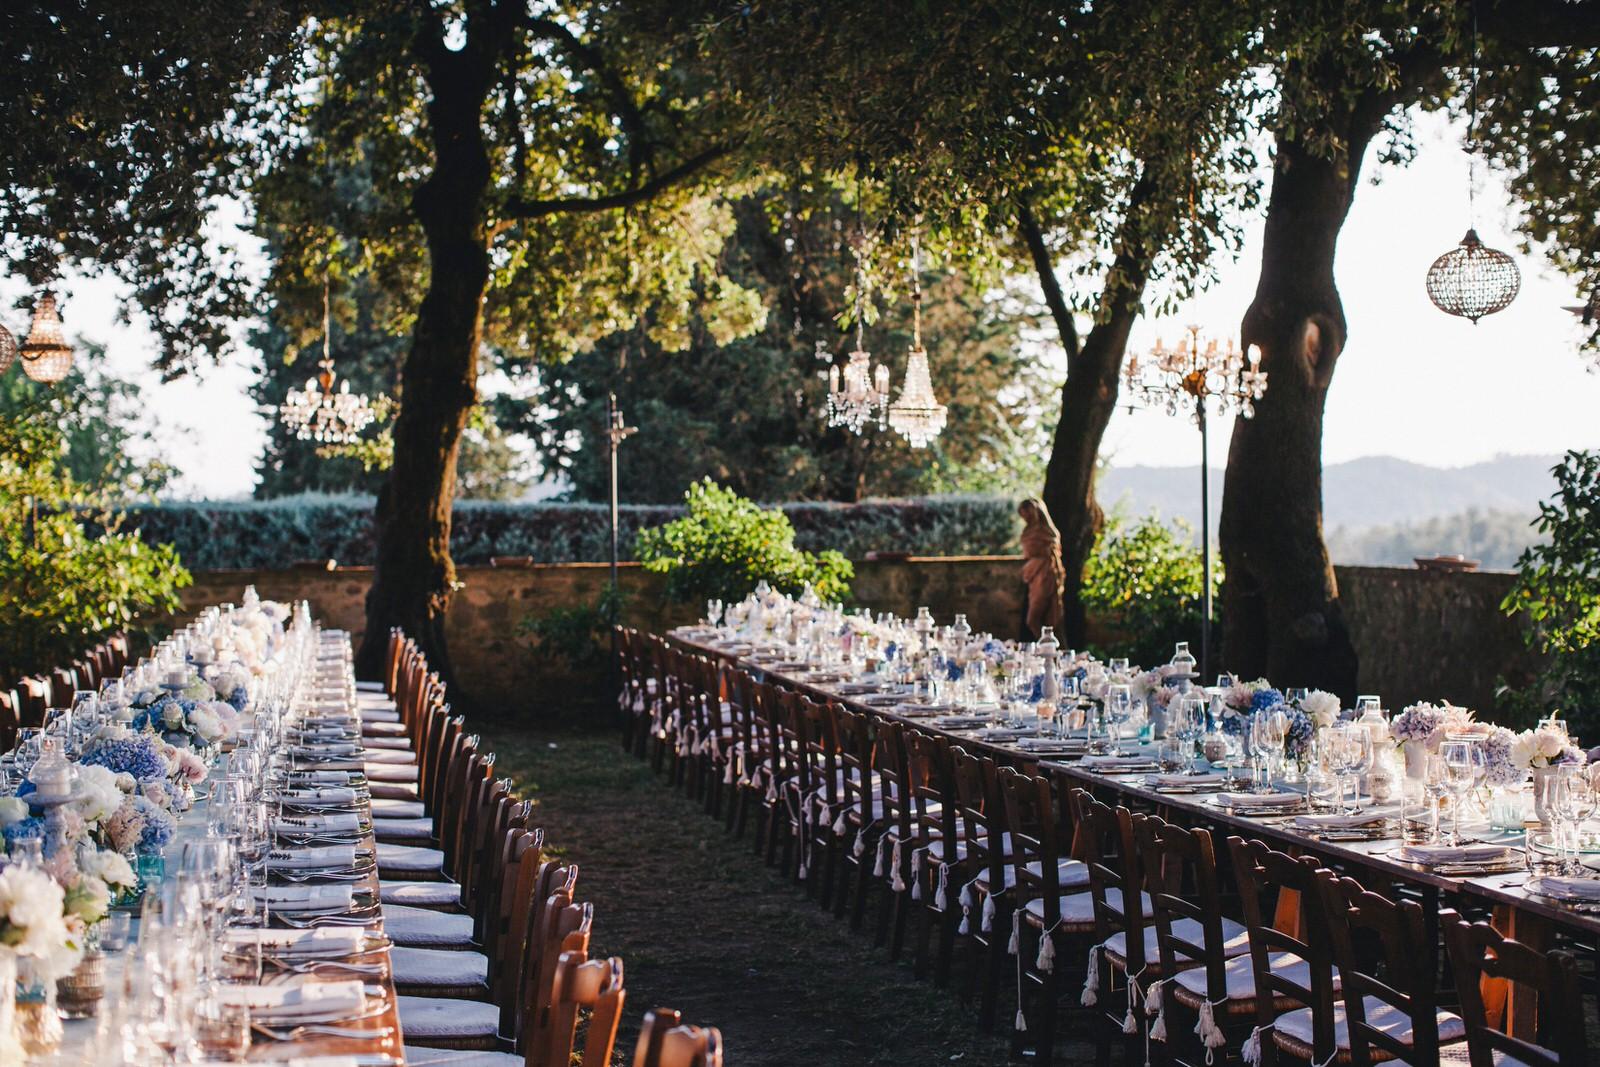 tuscany wedding table